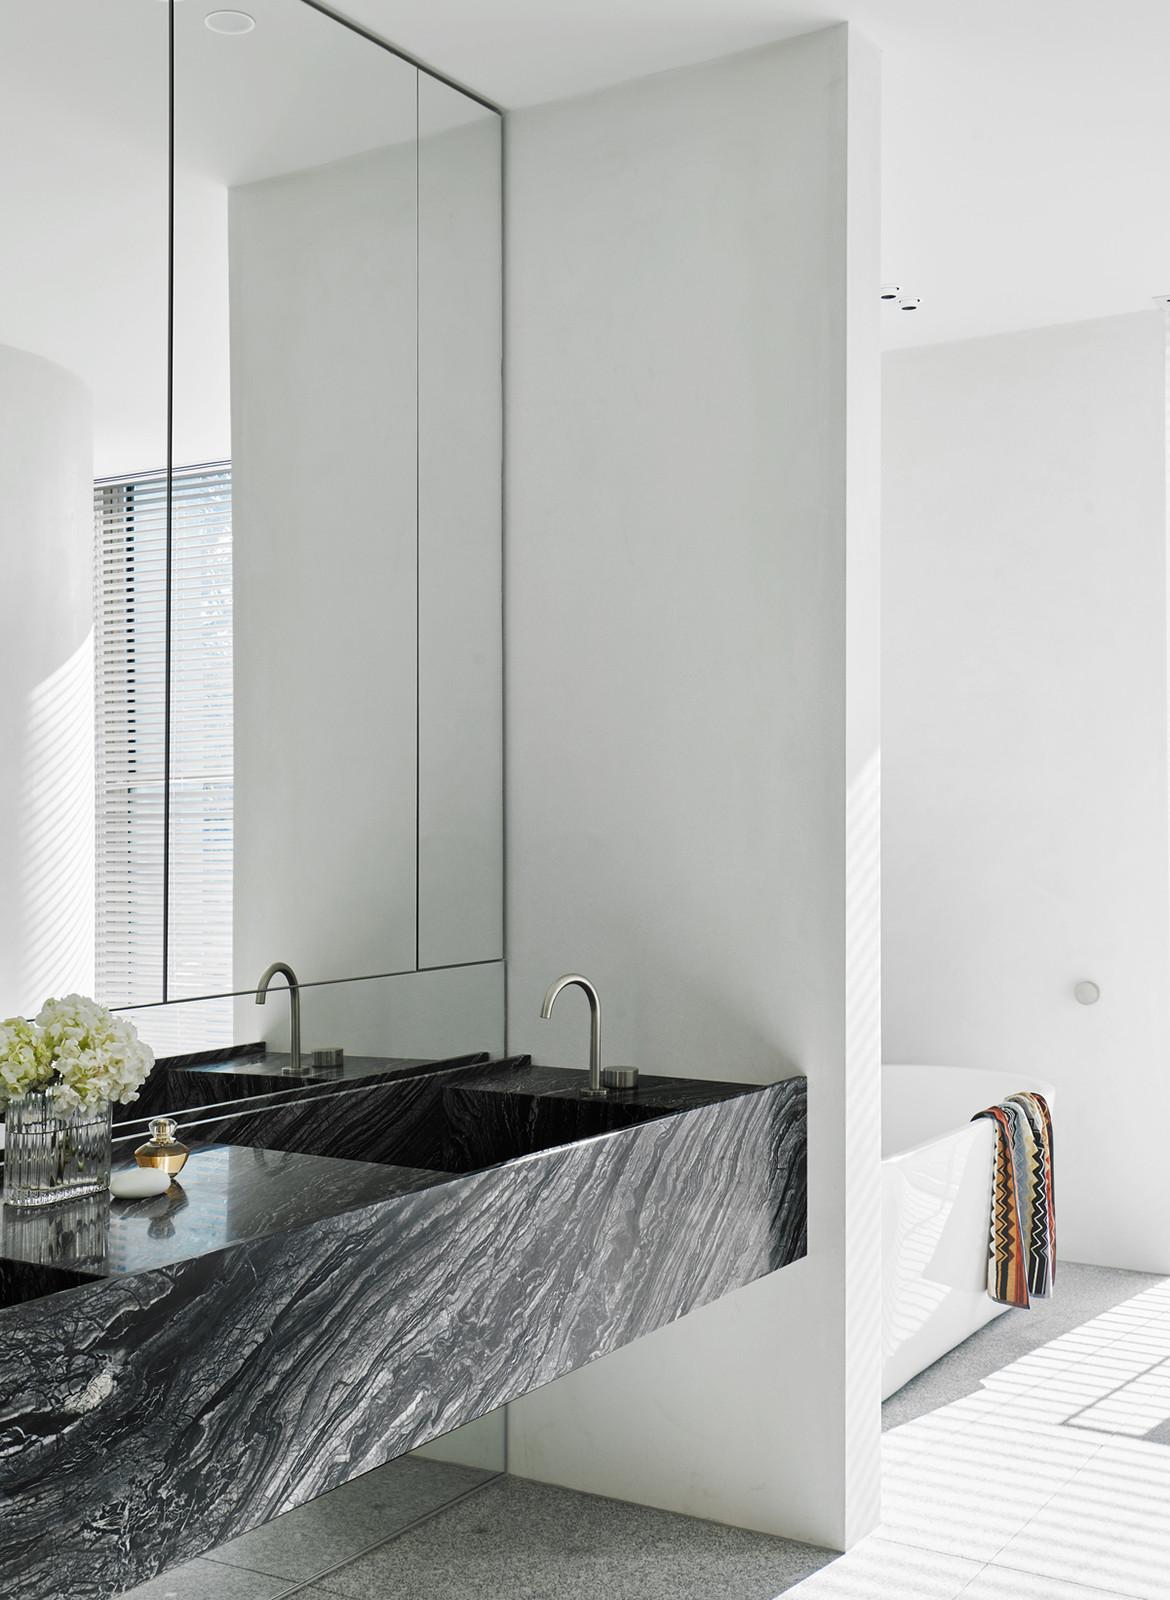 SLD Residence DavidovArchitects CC Veeral Patel bathroom